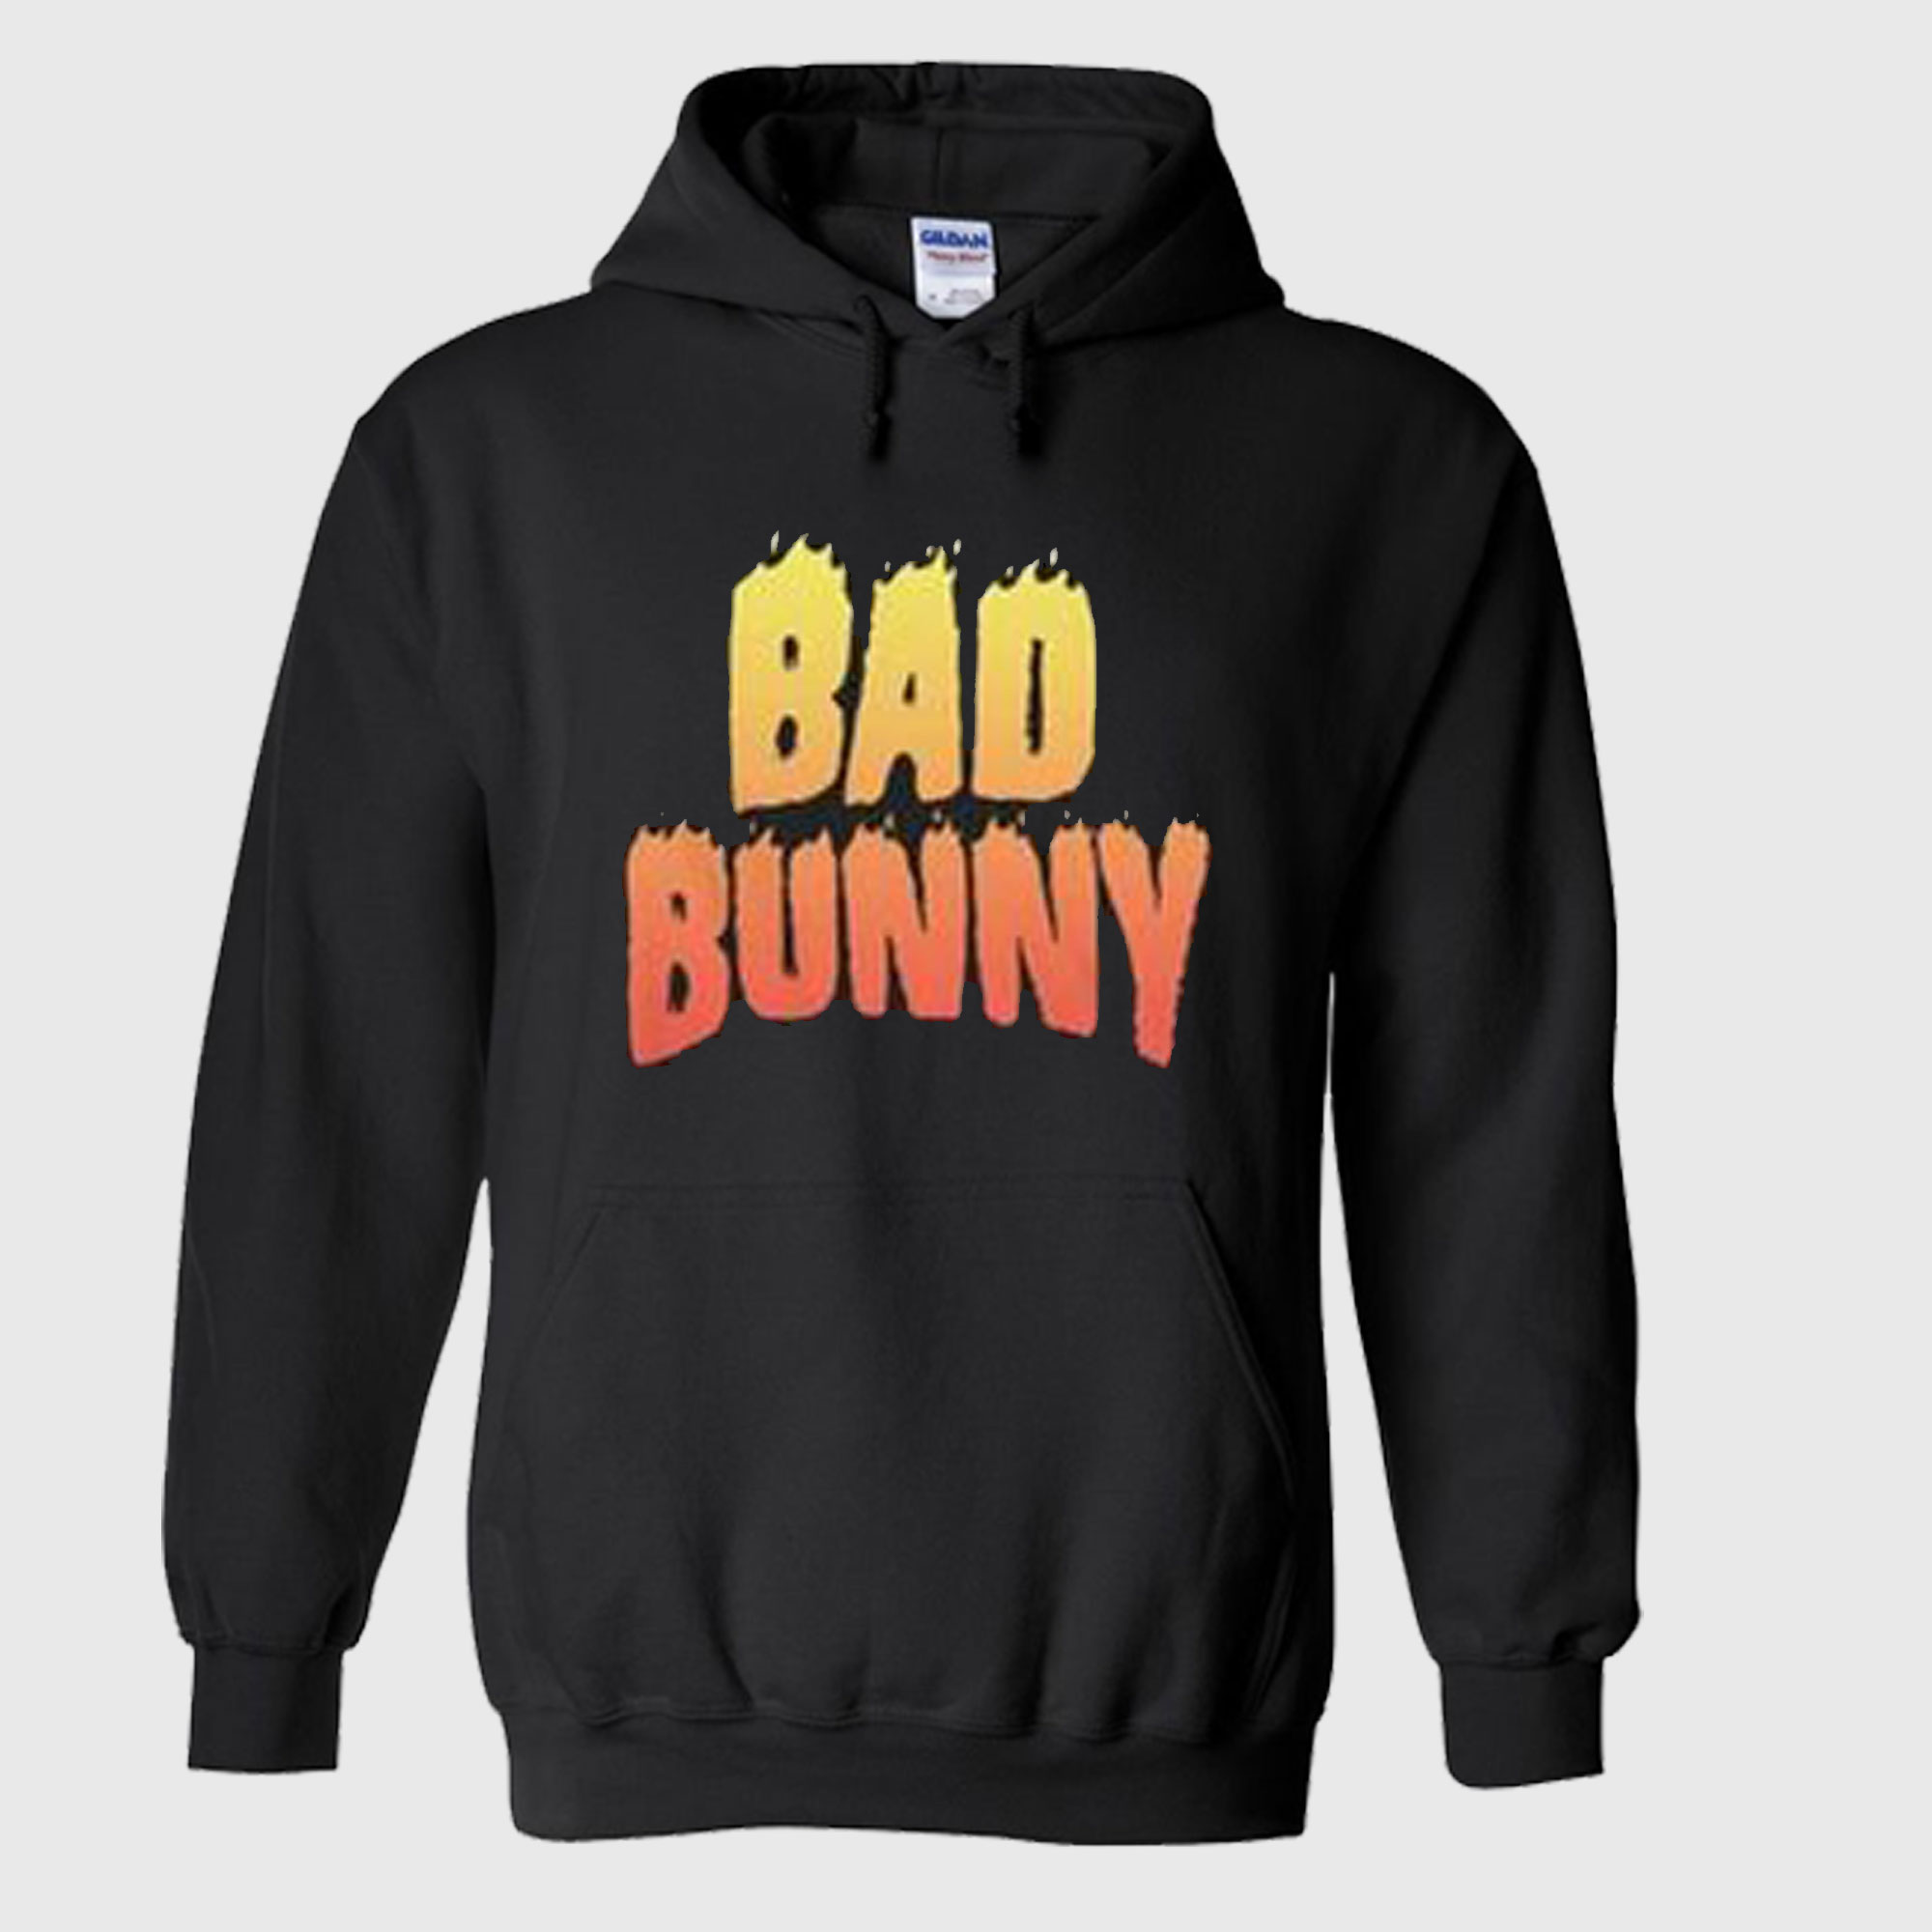 Bad Bunny Flame Hoodie